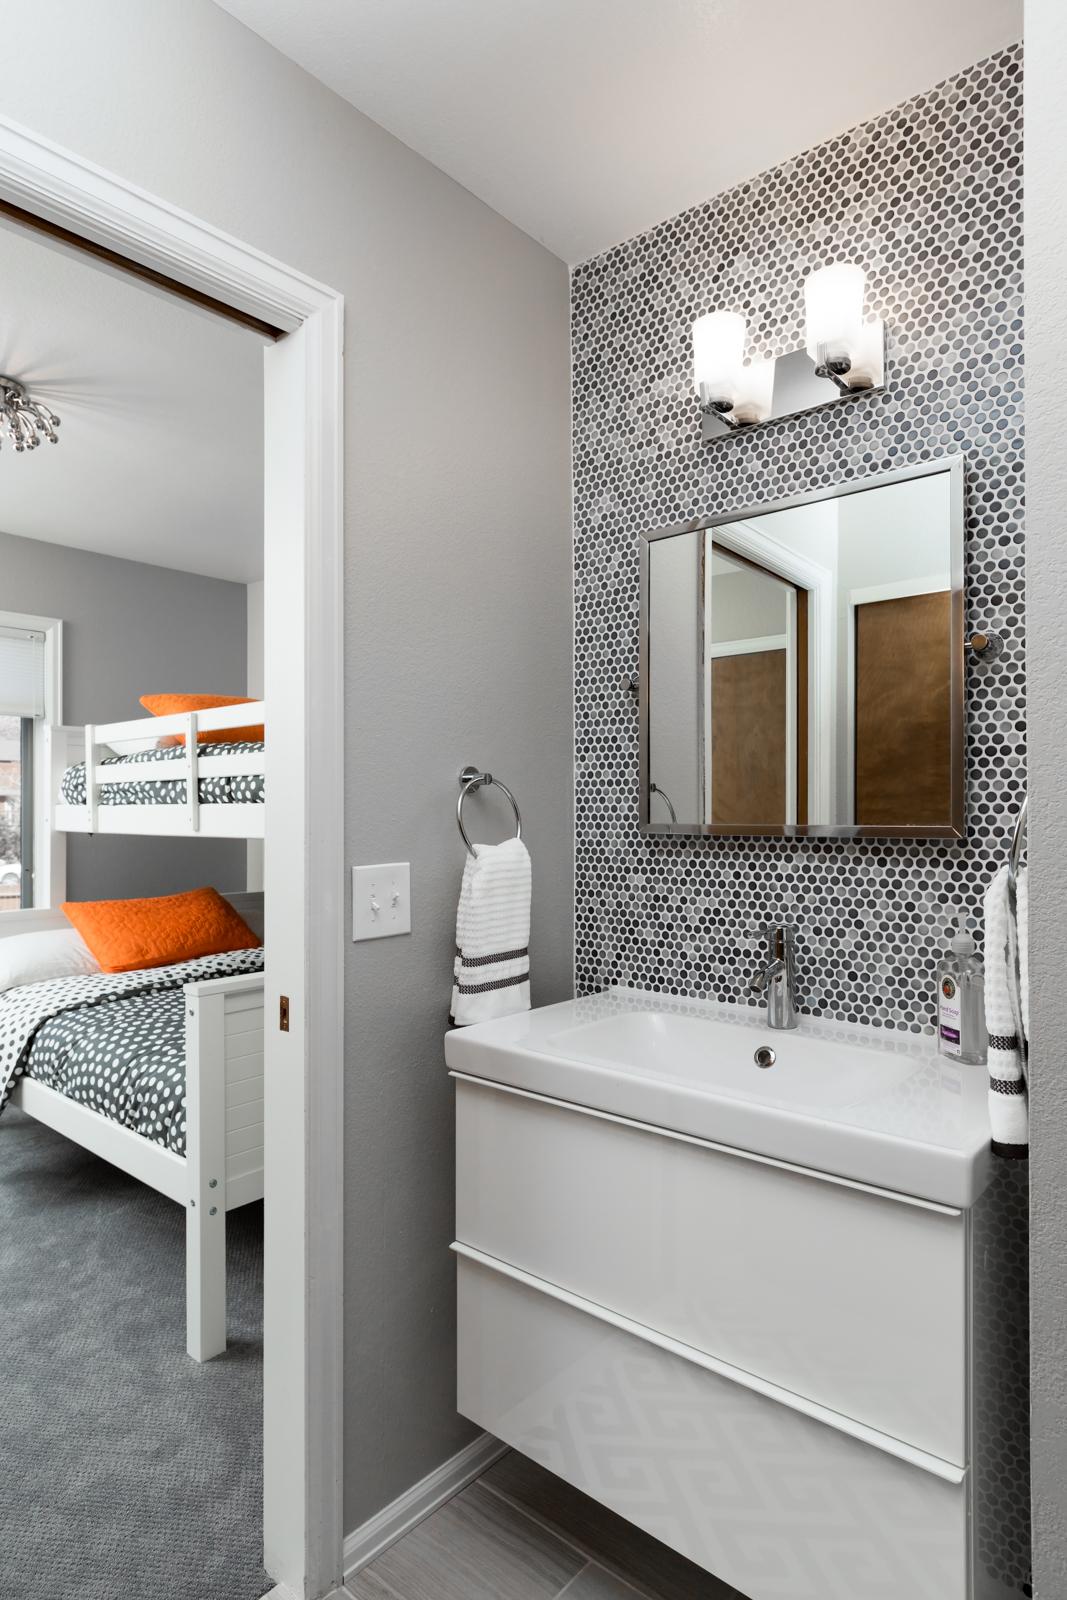 Second_bathroom-3128704324-O.jpg